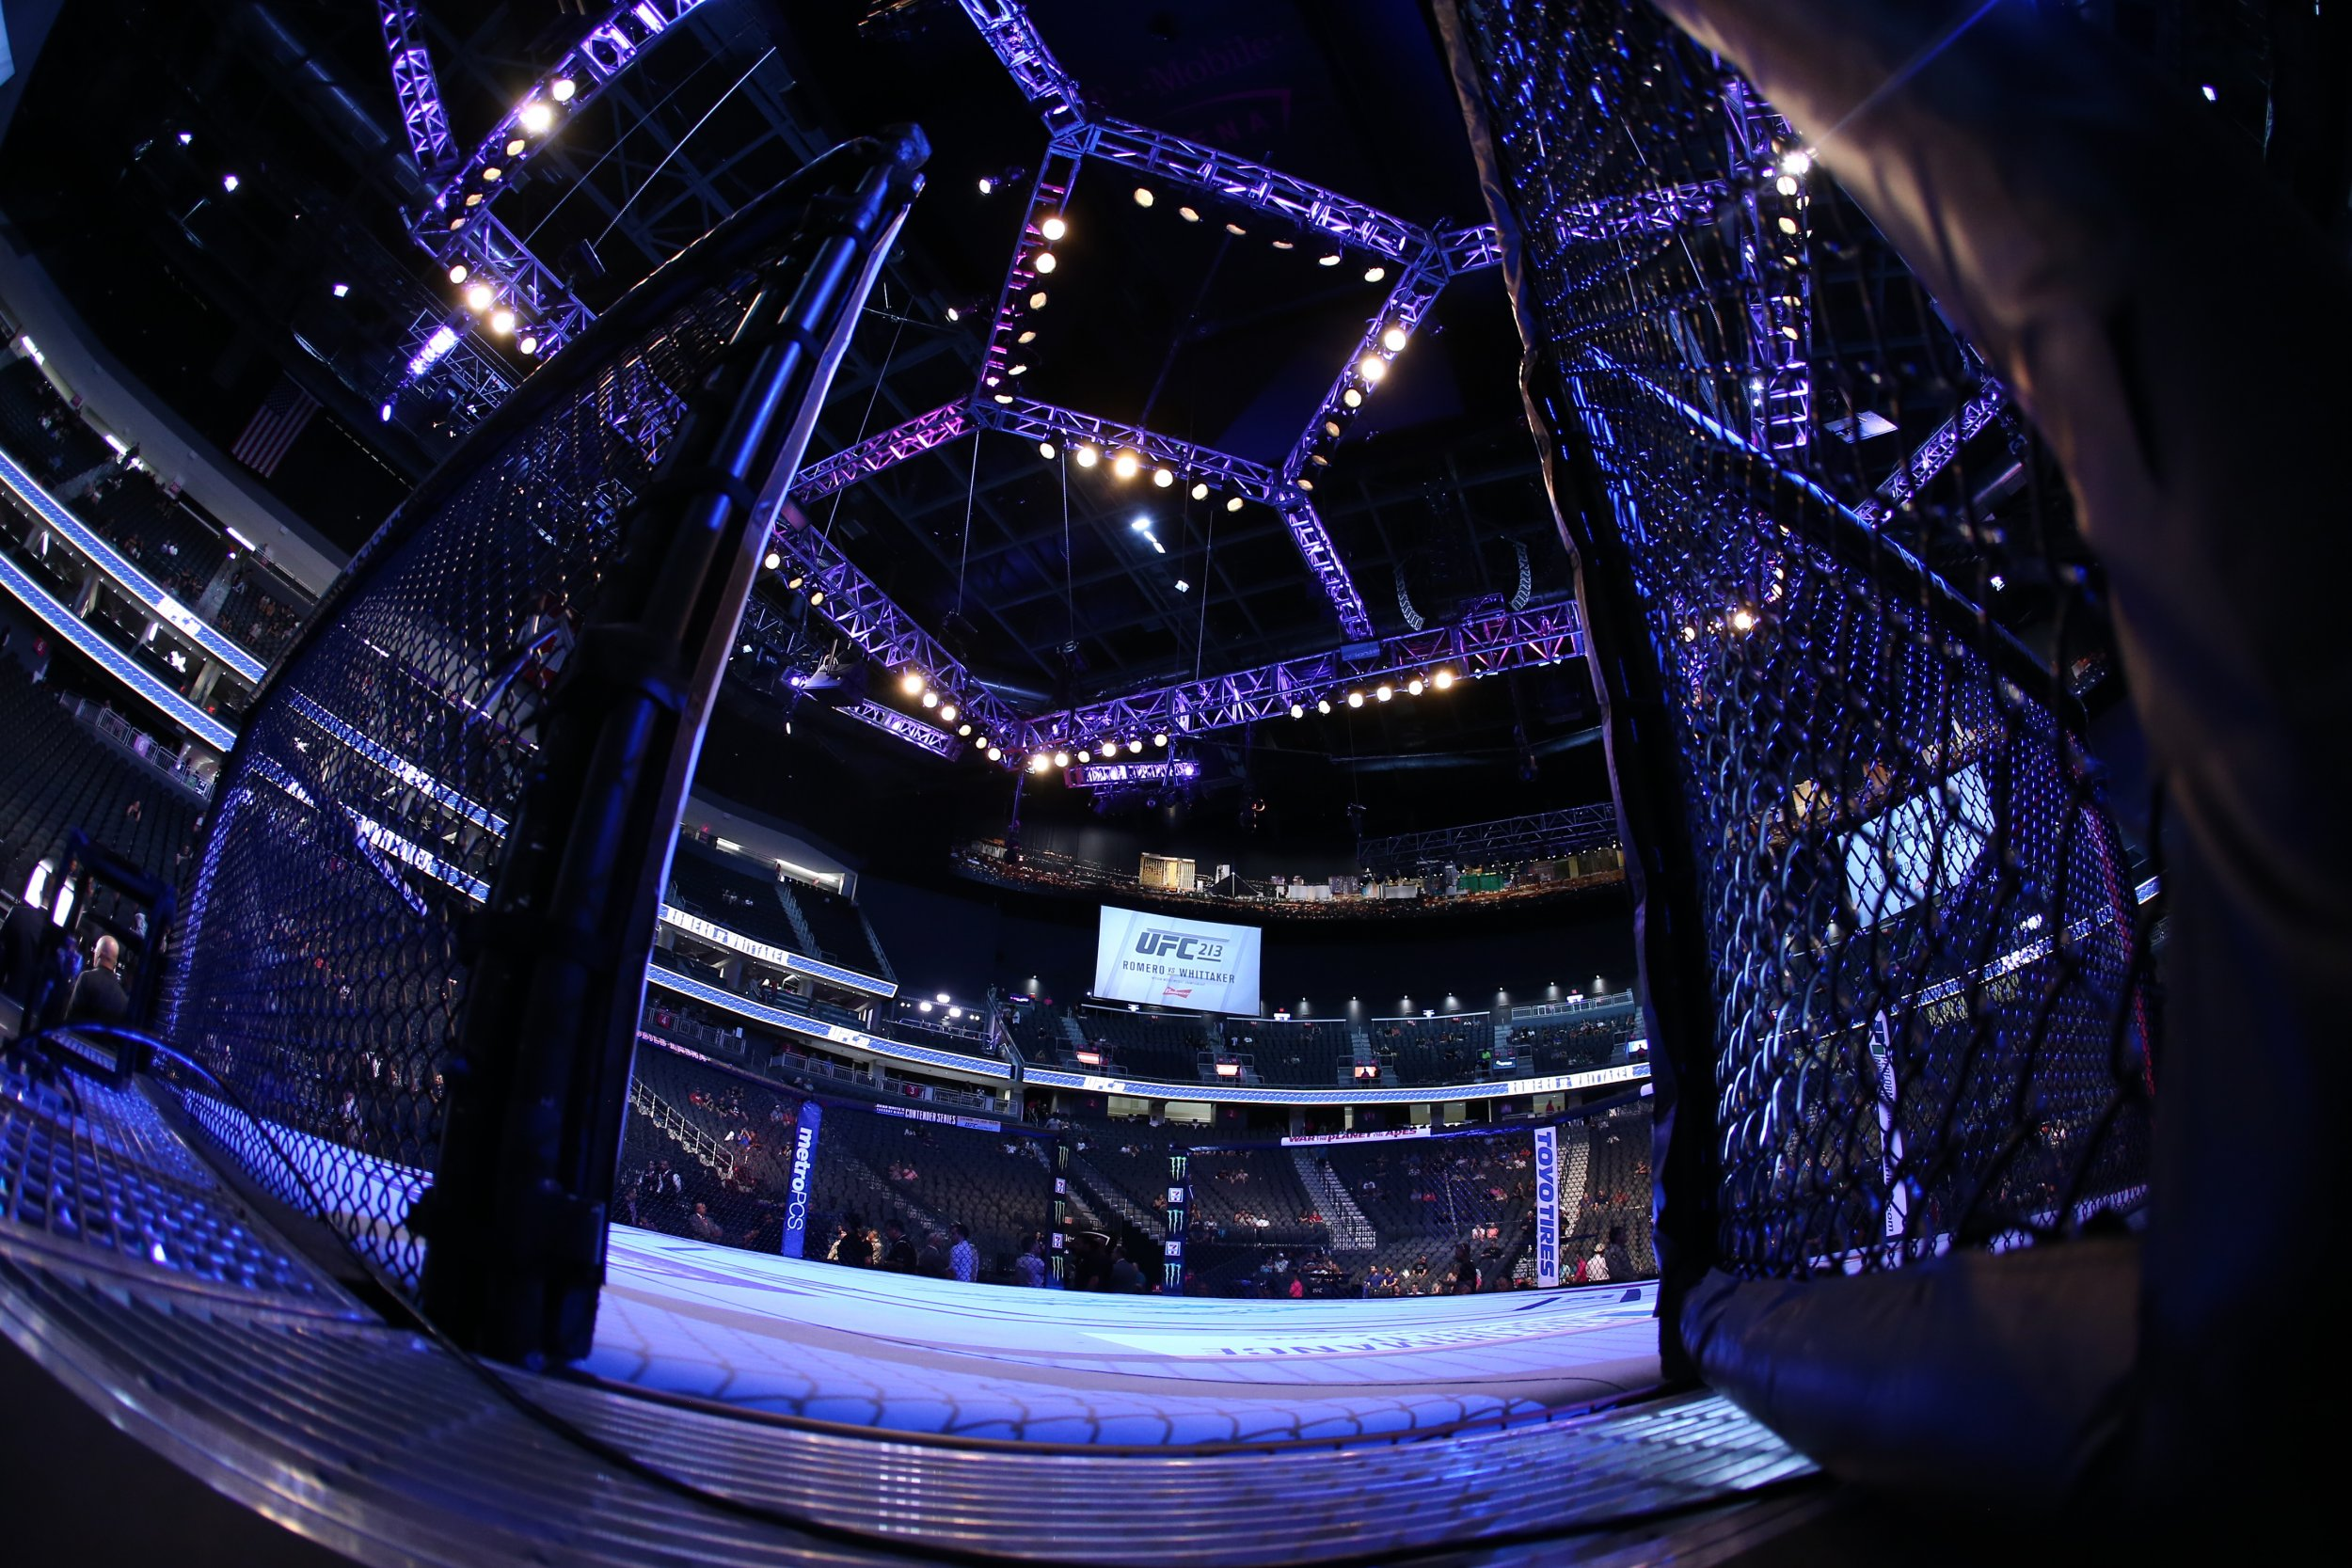 UFC Fighter Rachael Ostovich Suffers Apparent Attack